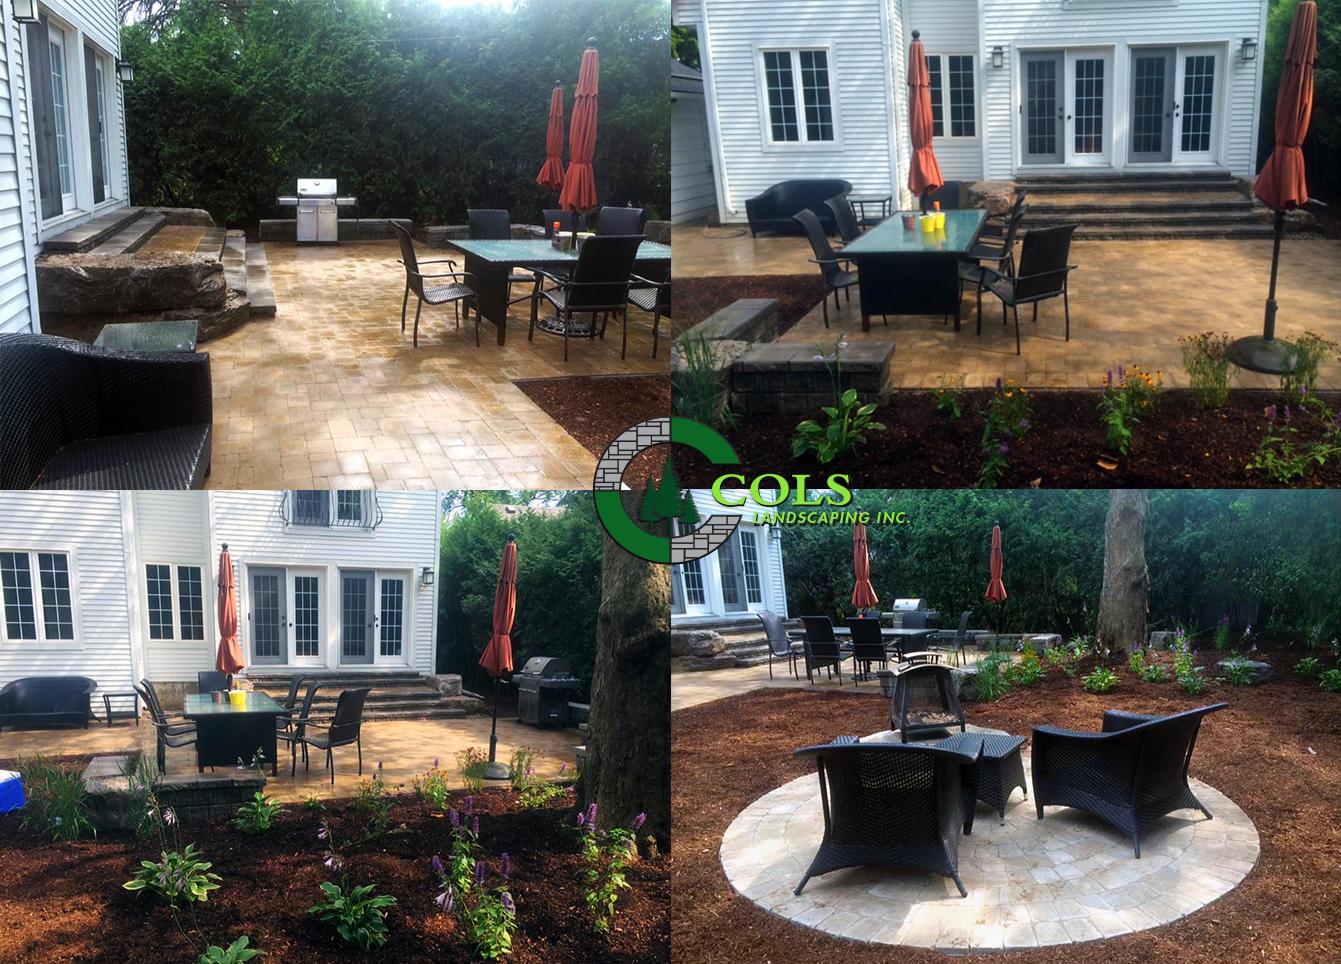 COLS backyard patio landscape ideas